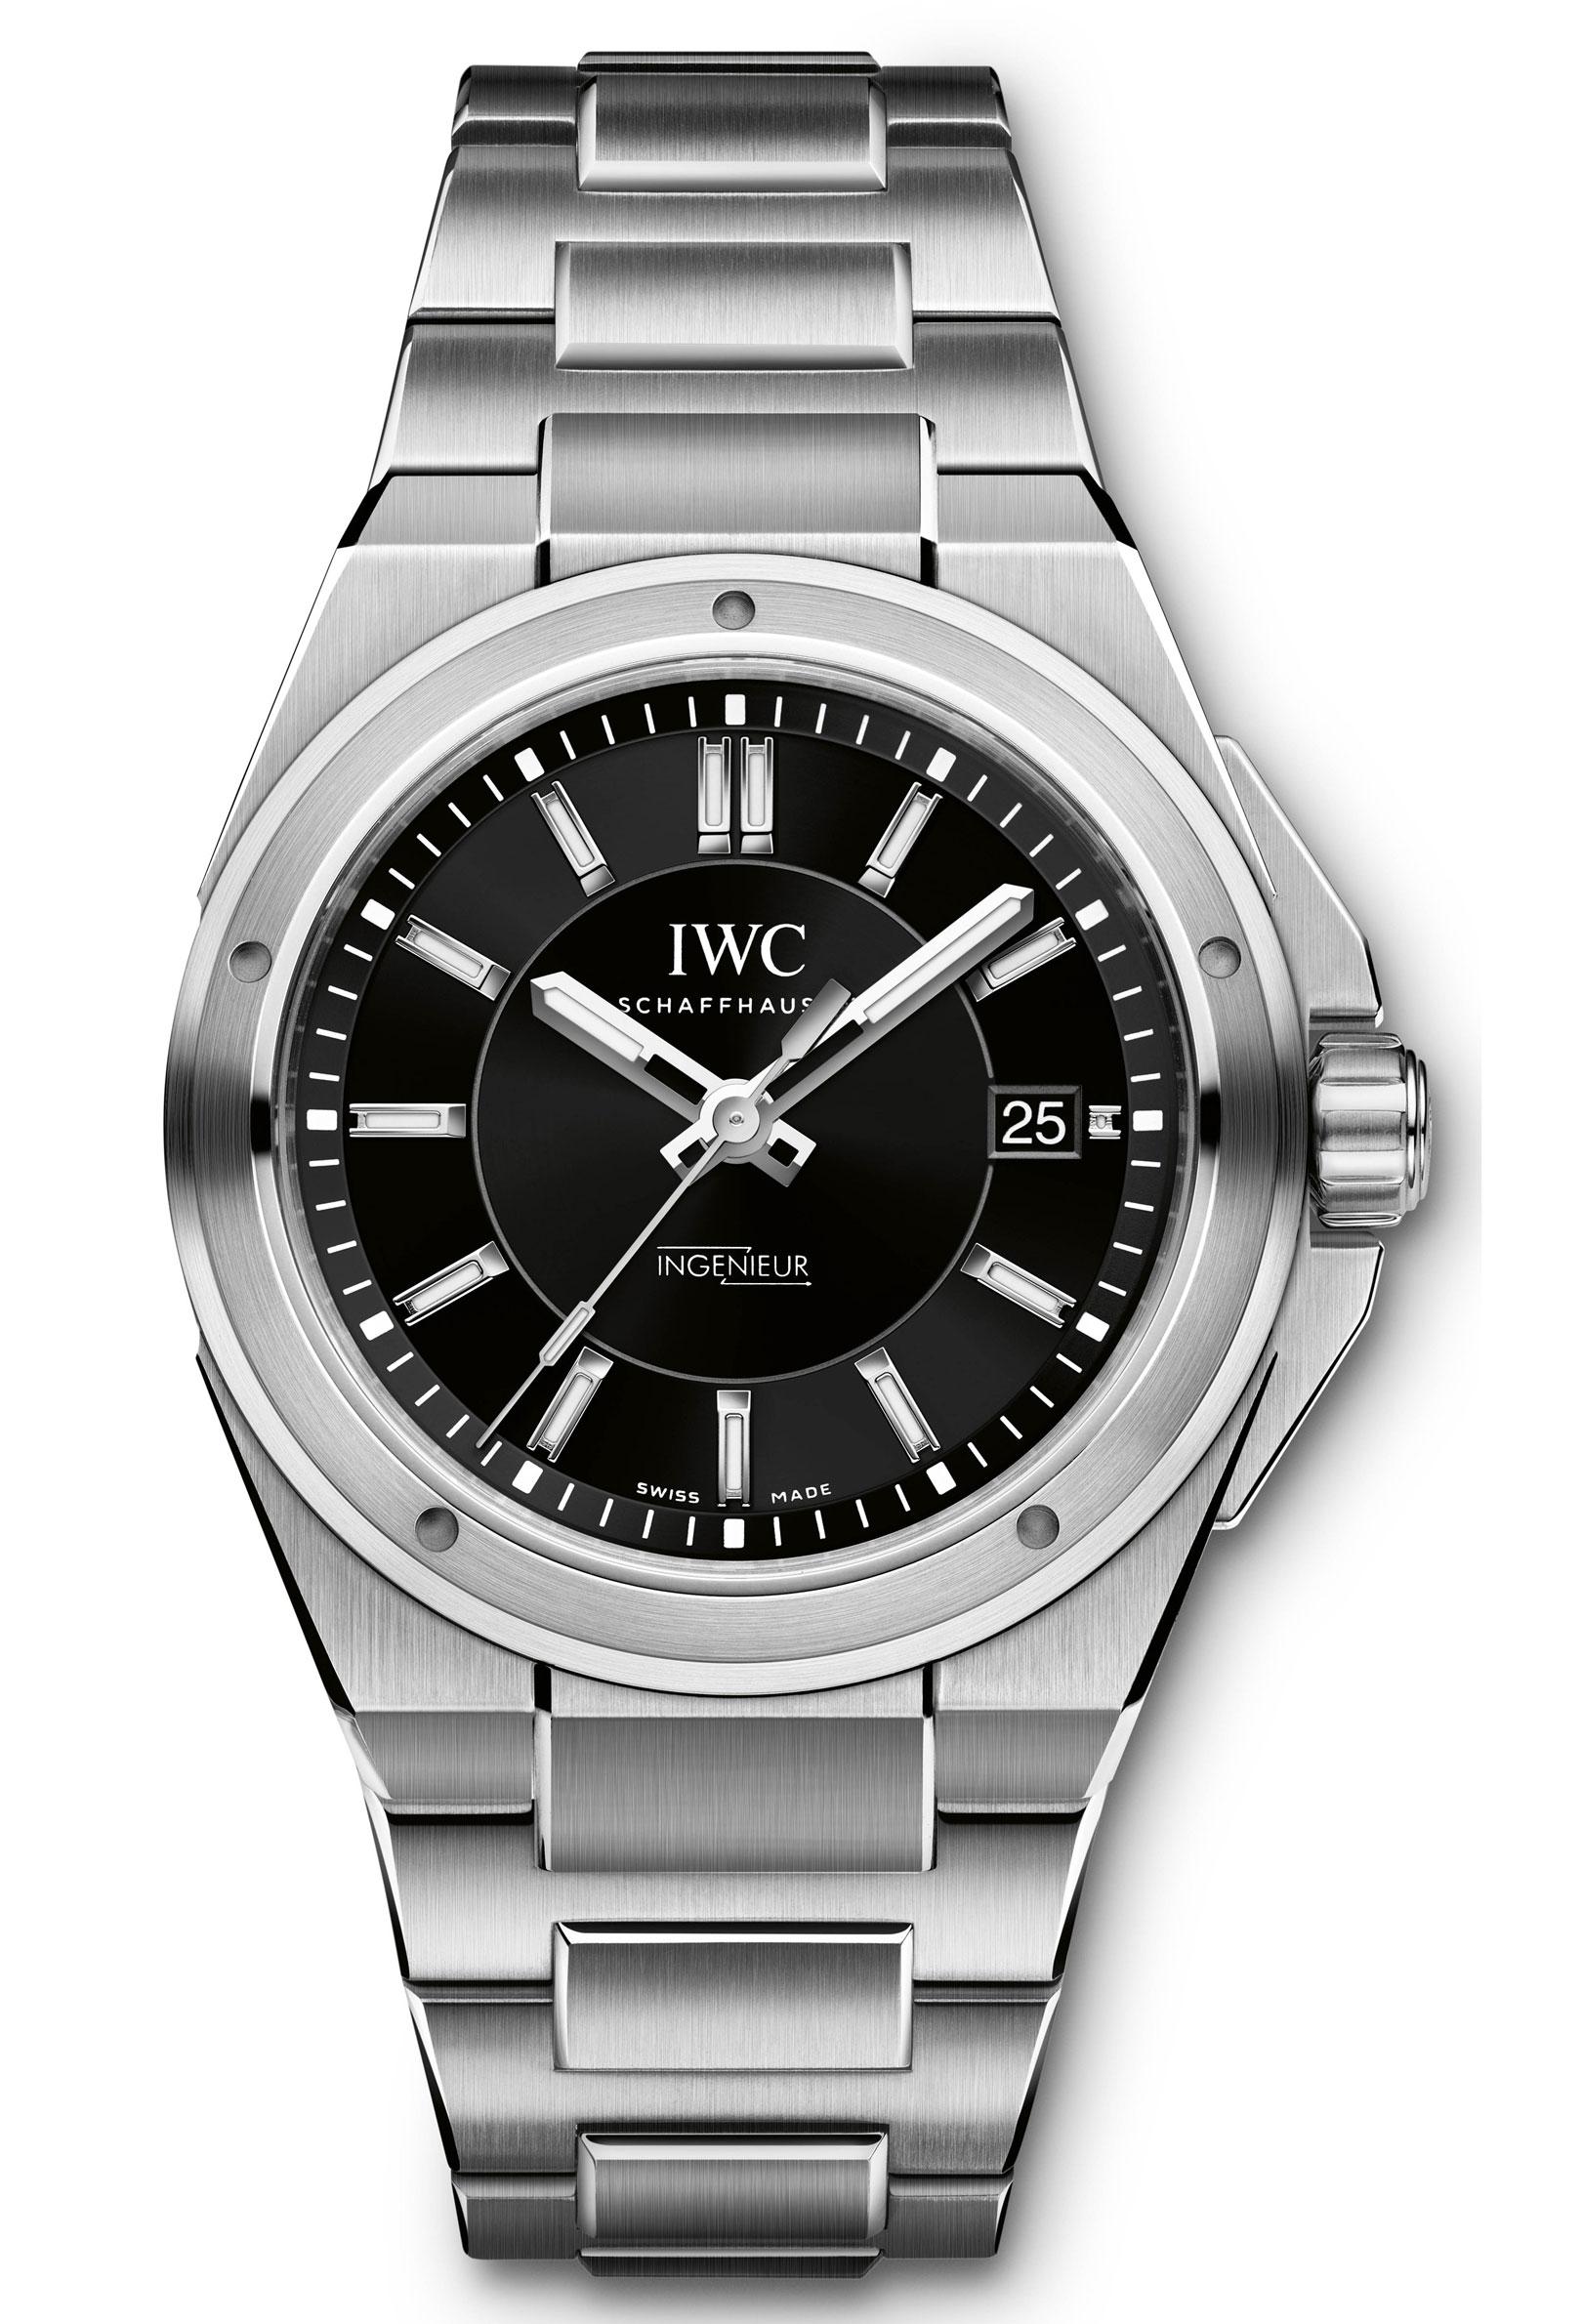 IWC-Ingenieur-Automatic